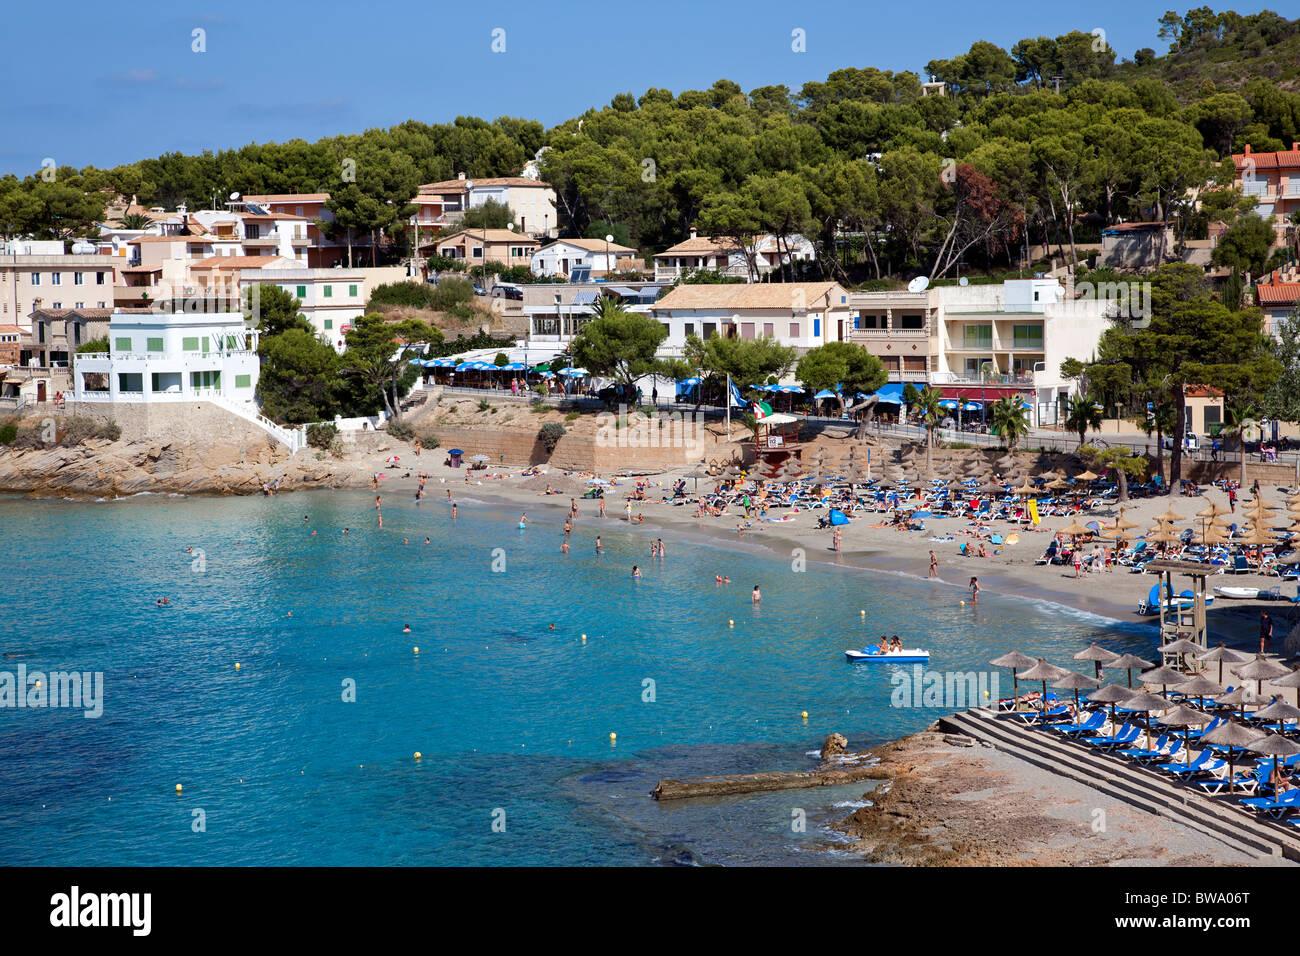 Hotel St Elm Mallorca